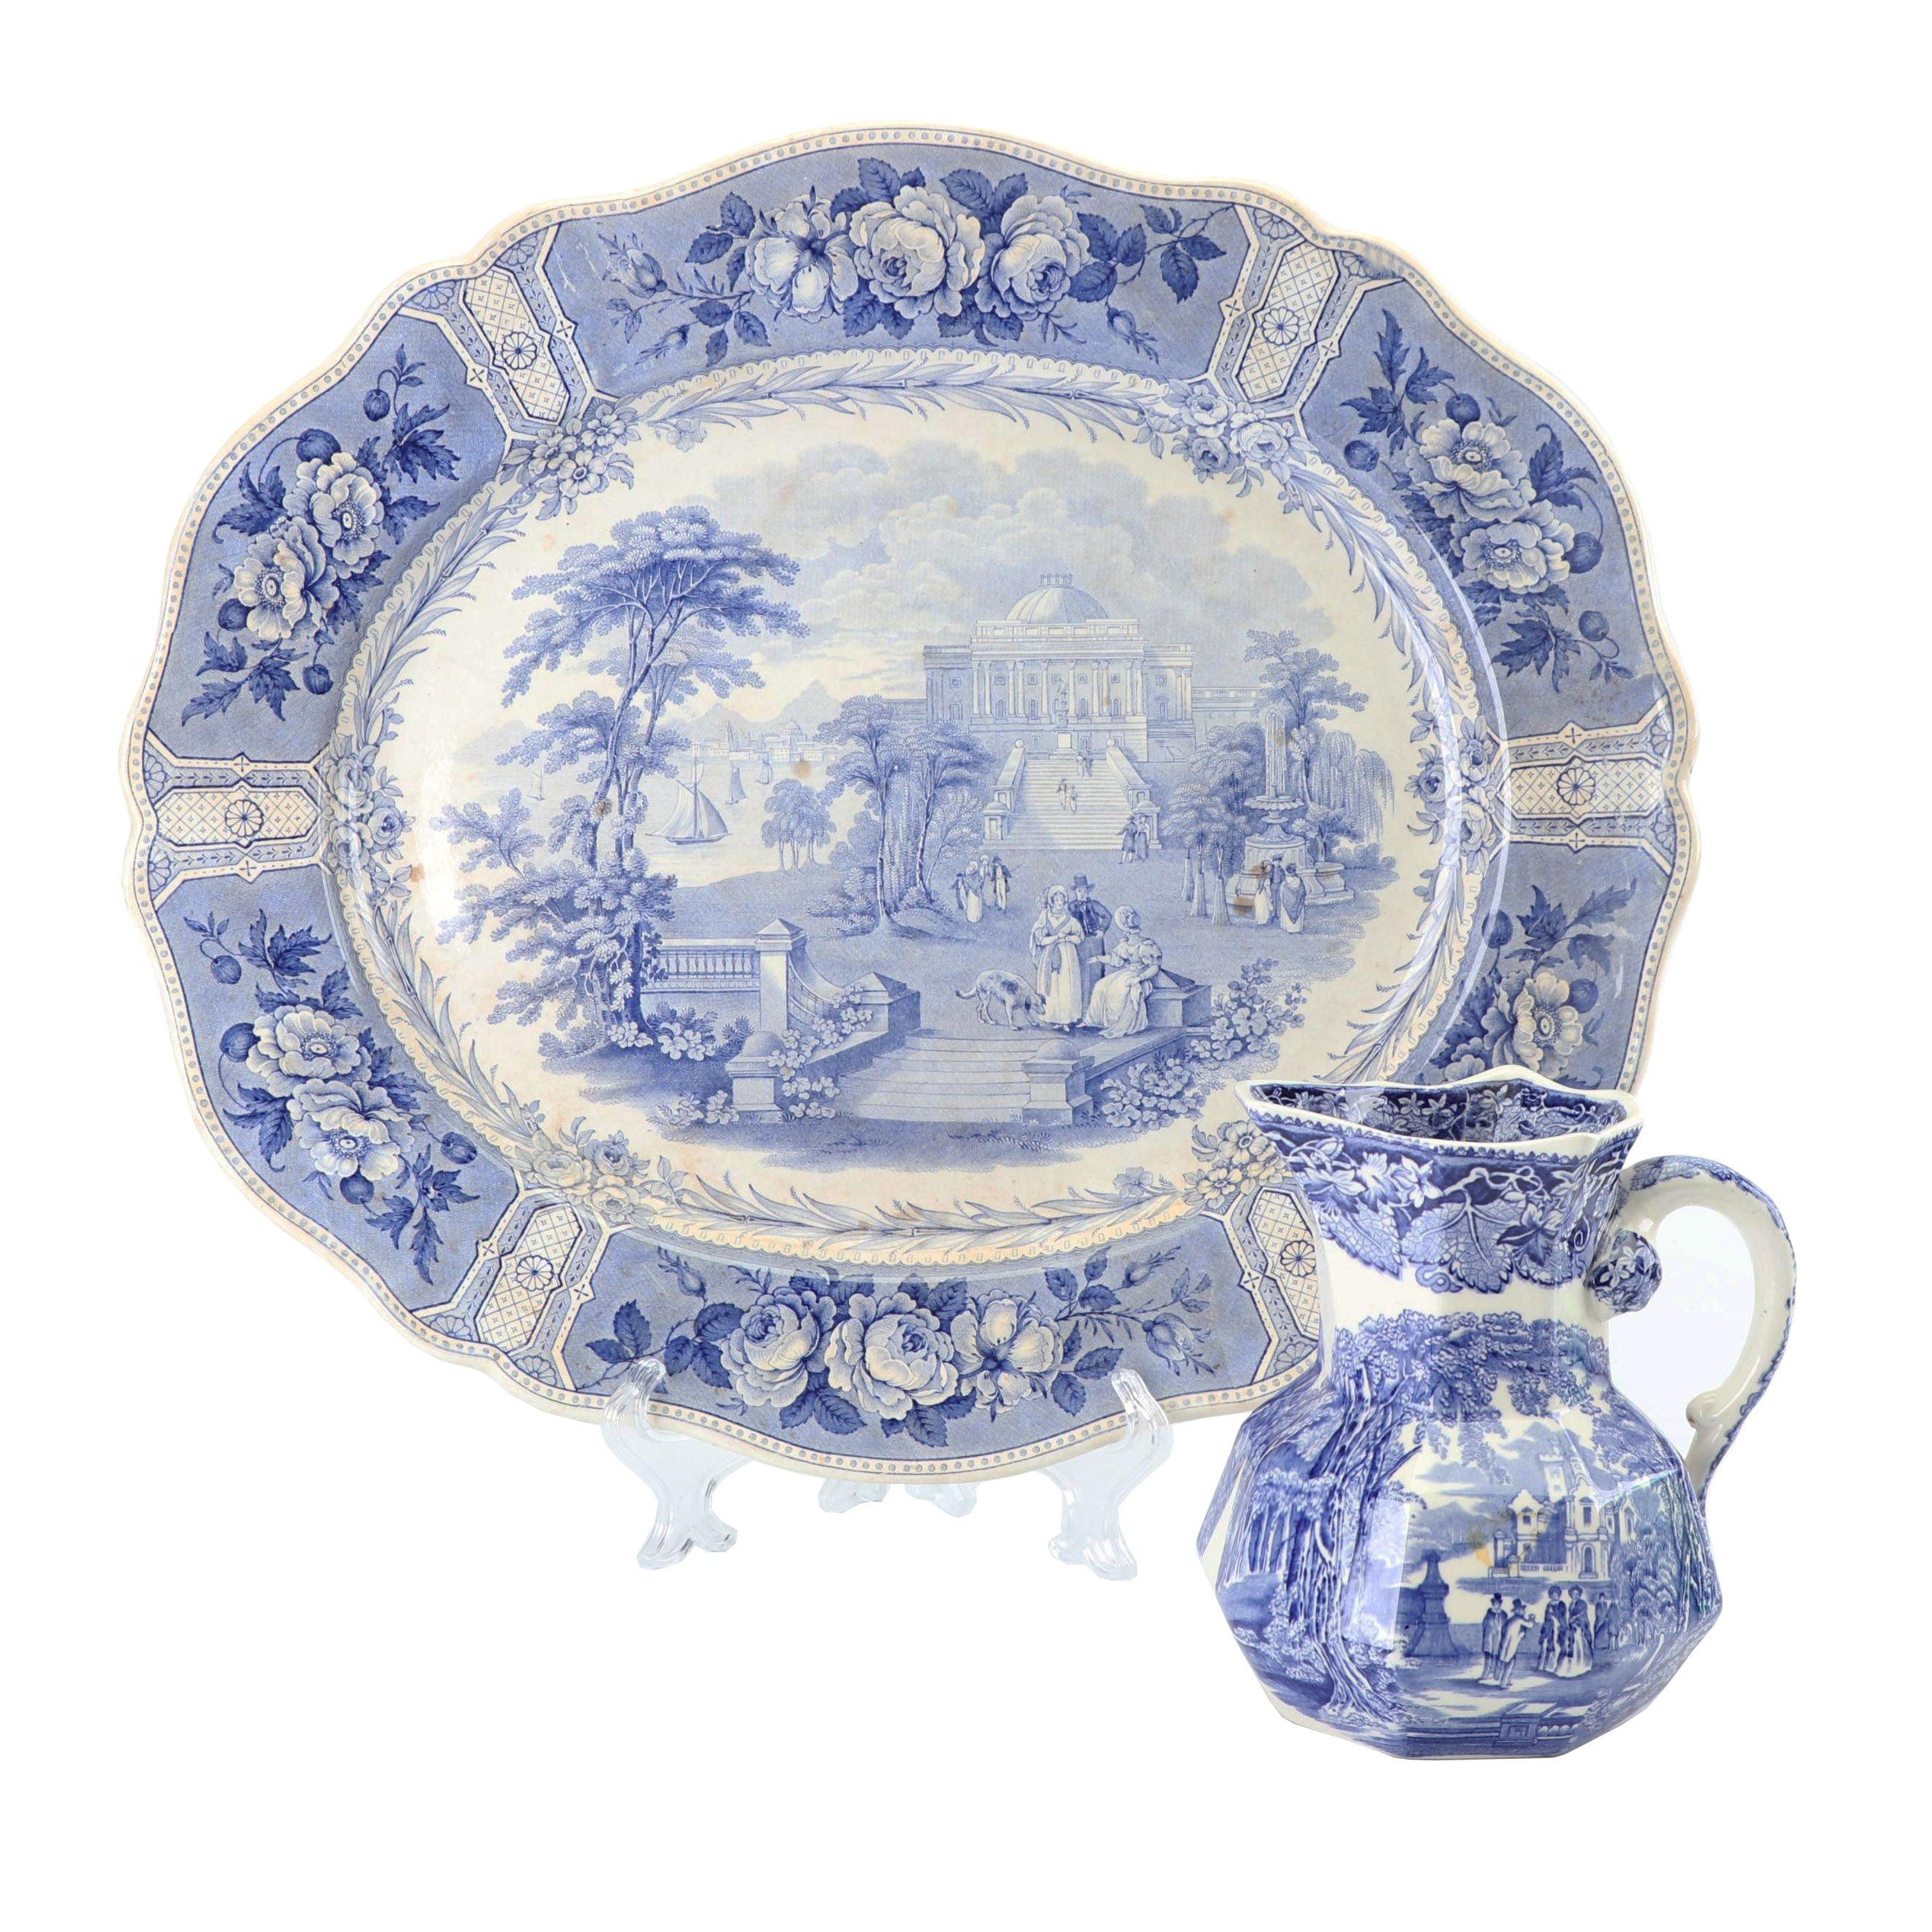 "Mason's ""Vista"" Ironstone Pitcher with Antique Blue Transfer-Printed Platter"